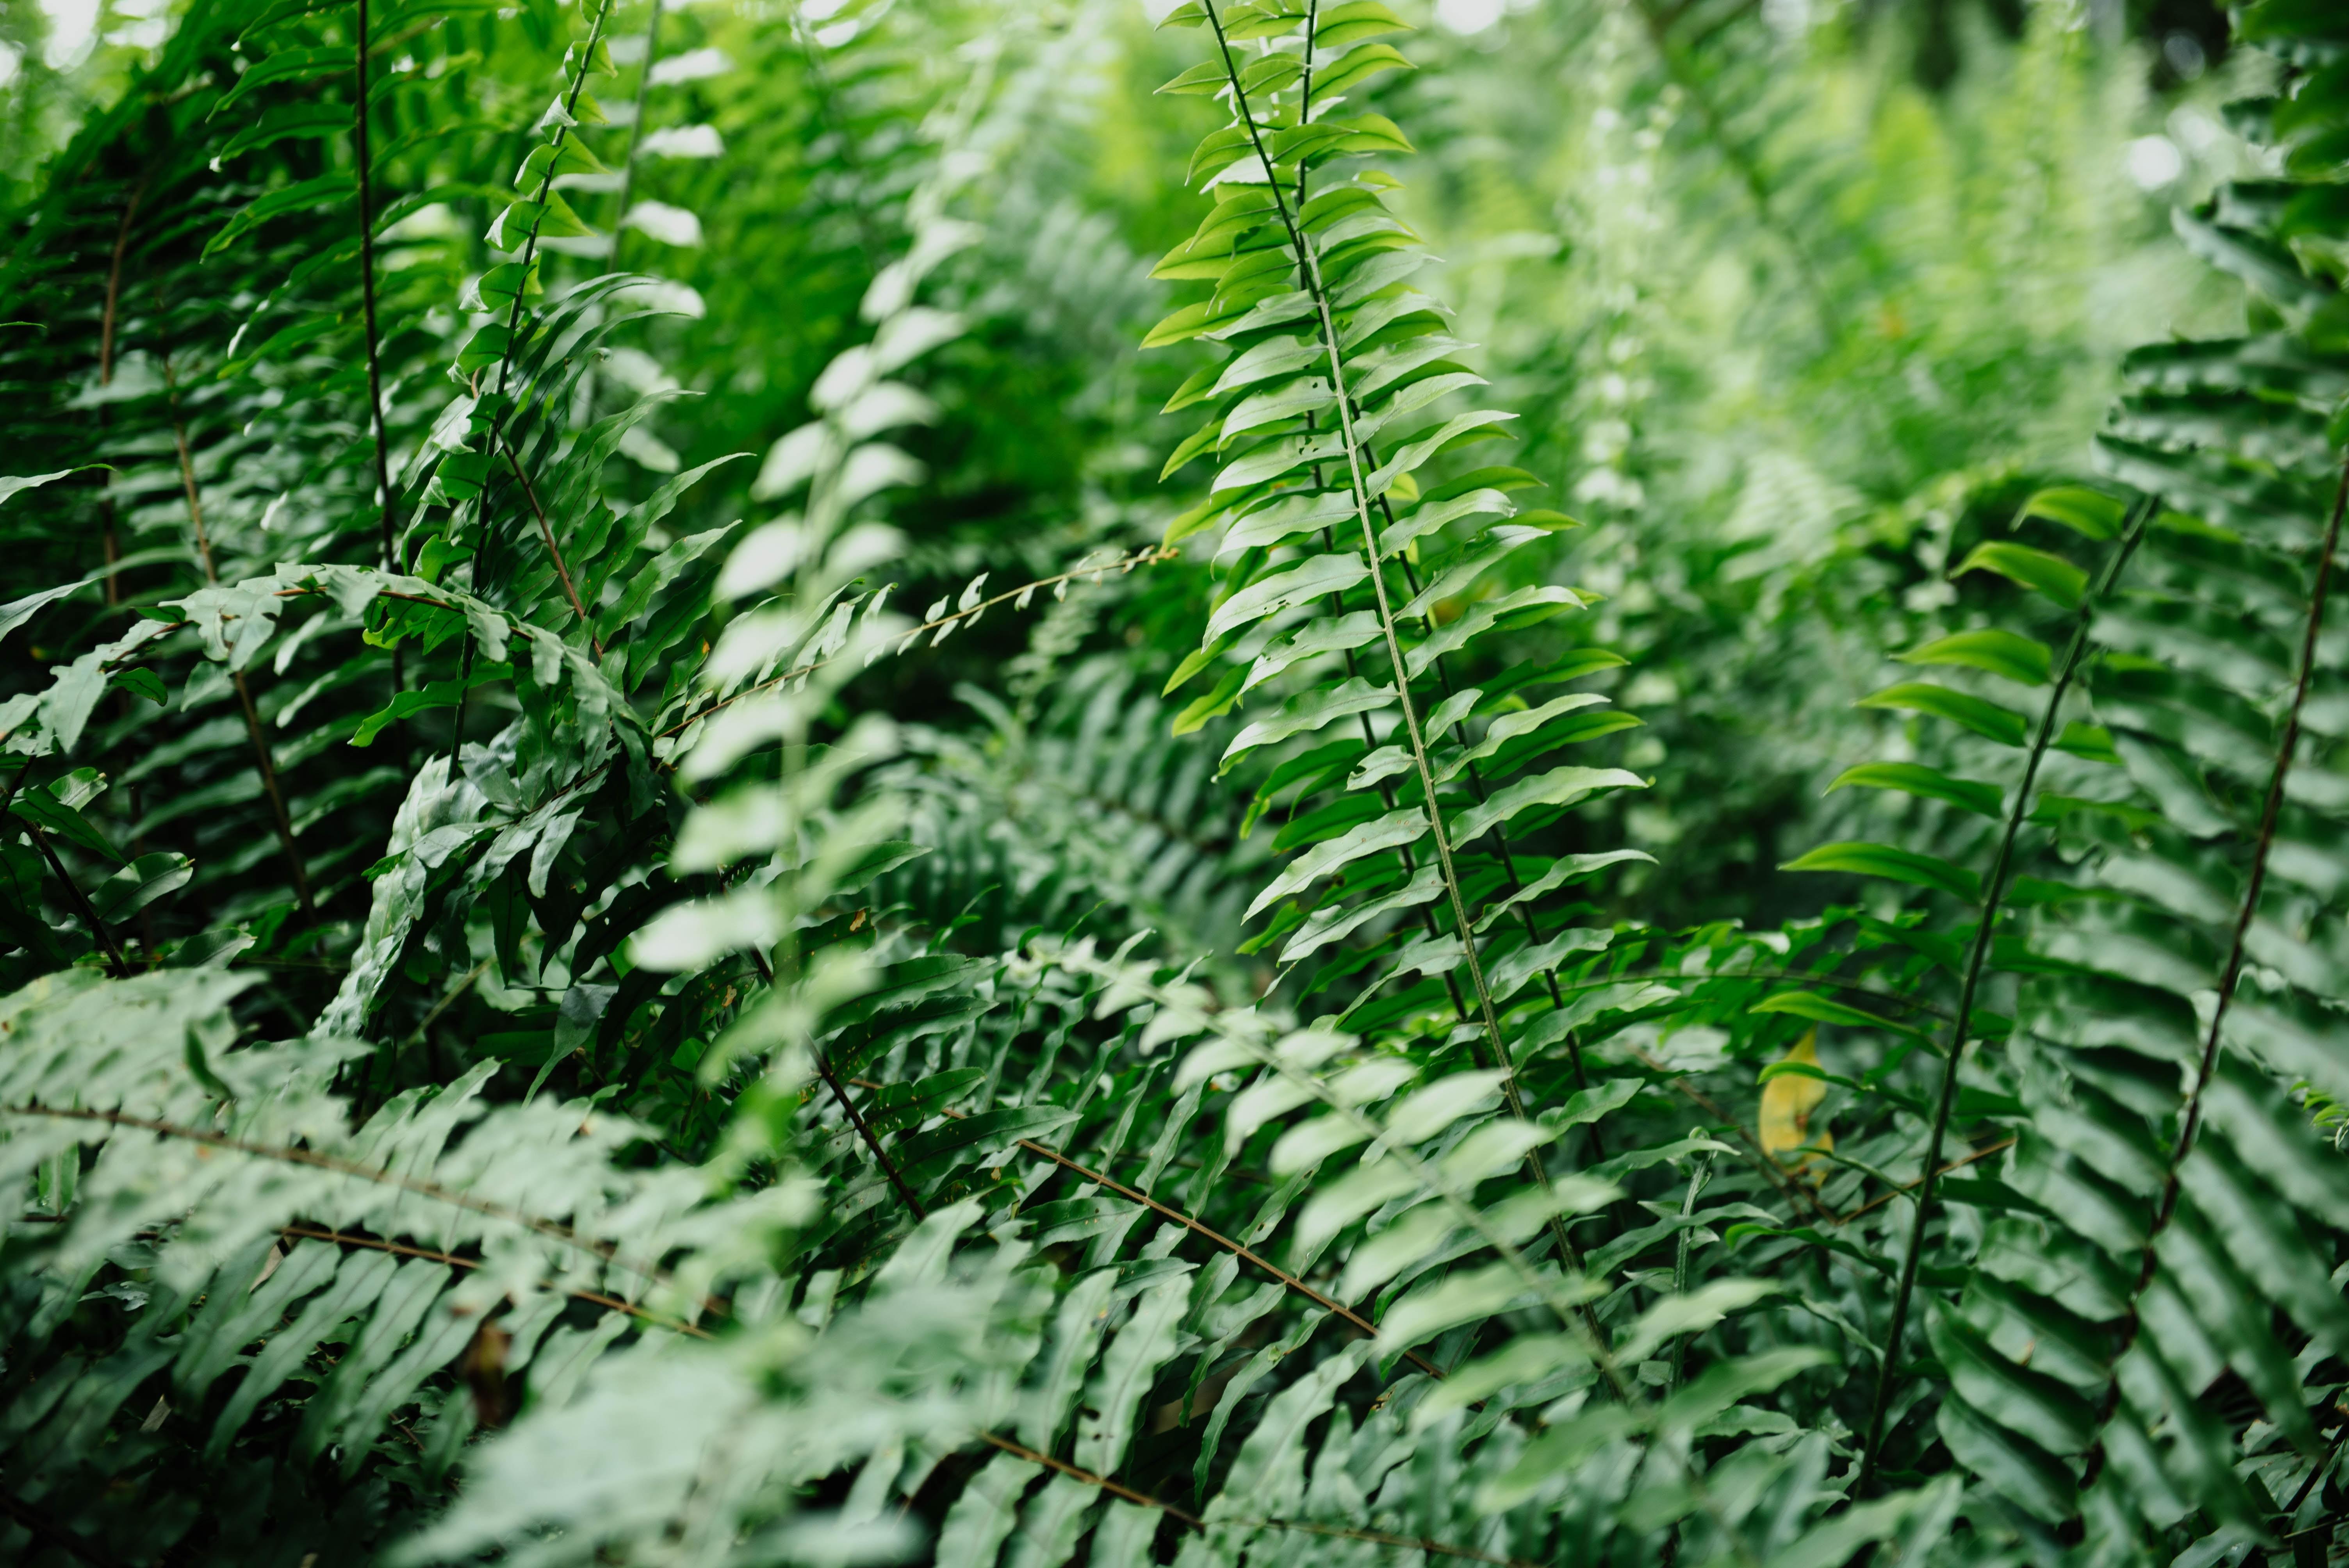 green fern plants at daytime